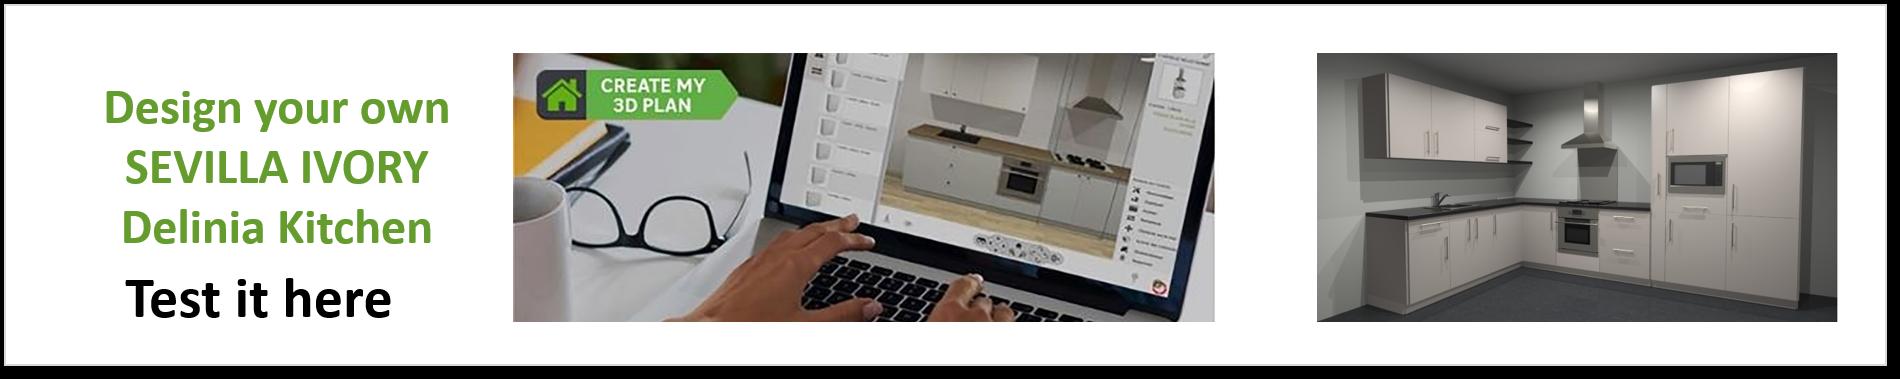 Create or Design your own Delinia Sevilla Ivory Designer Kitchen